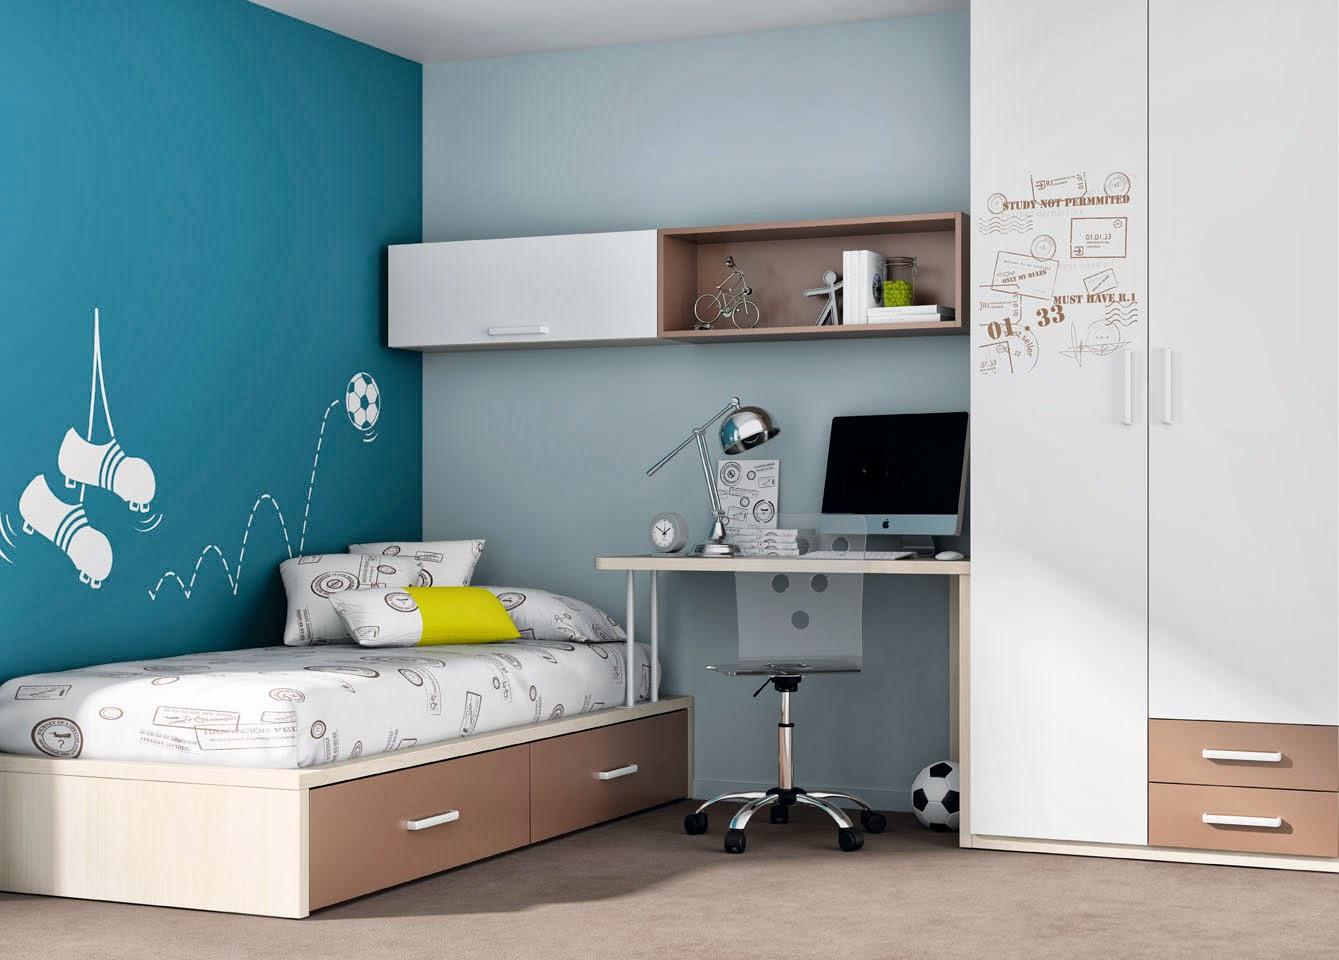 Divi rtete pintando tu habitaci n juvenil - Como pintar dormitorio juvenil ...